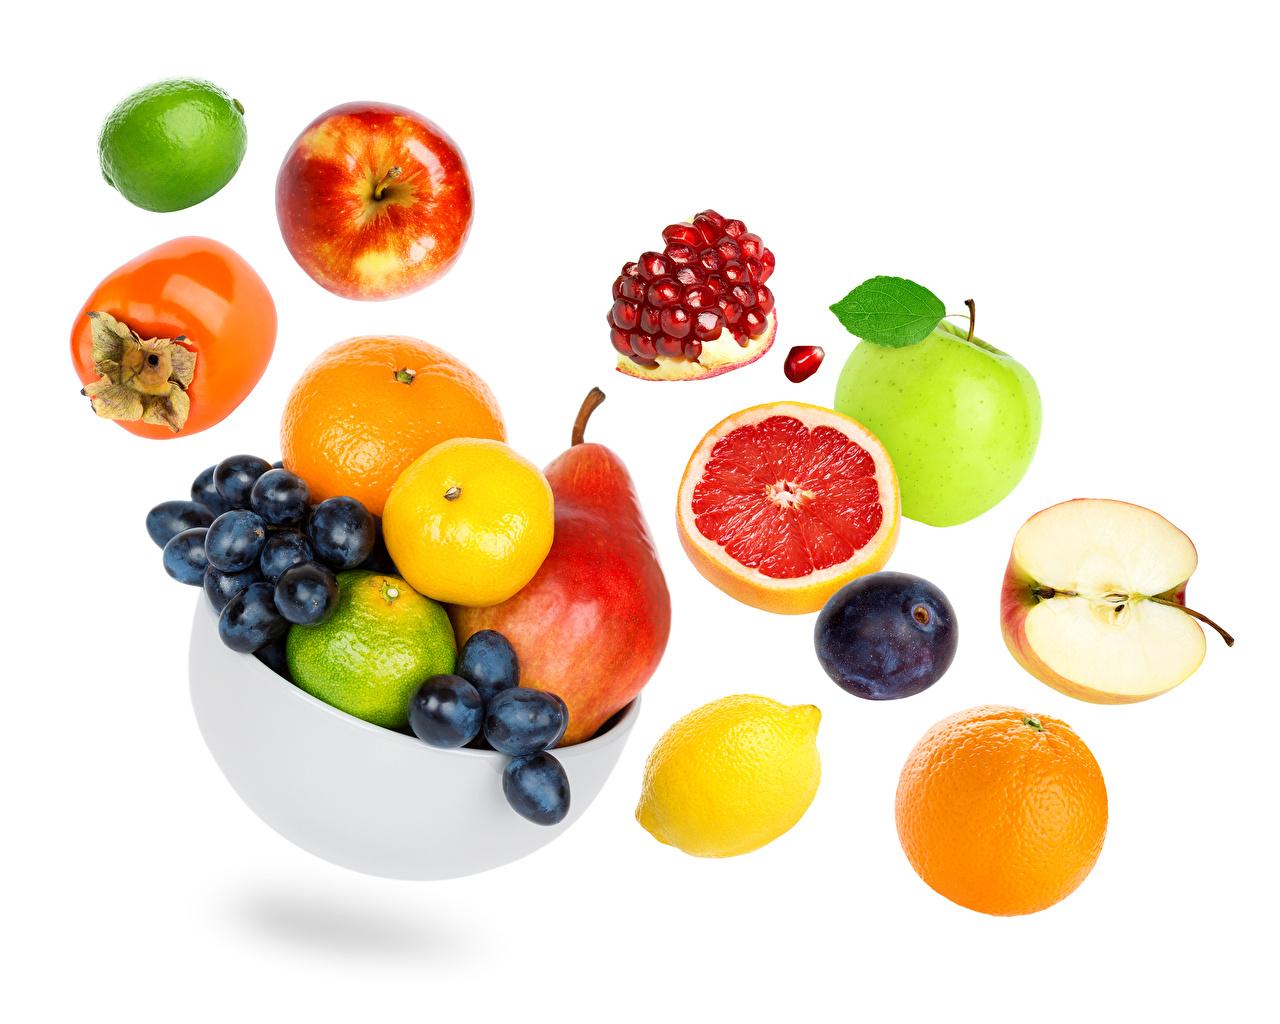 Picture kaki Grapefruit Orange fruit Pears Plums Apples Grapes Pomegranate Food Fruit White background Persimmon